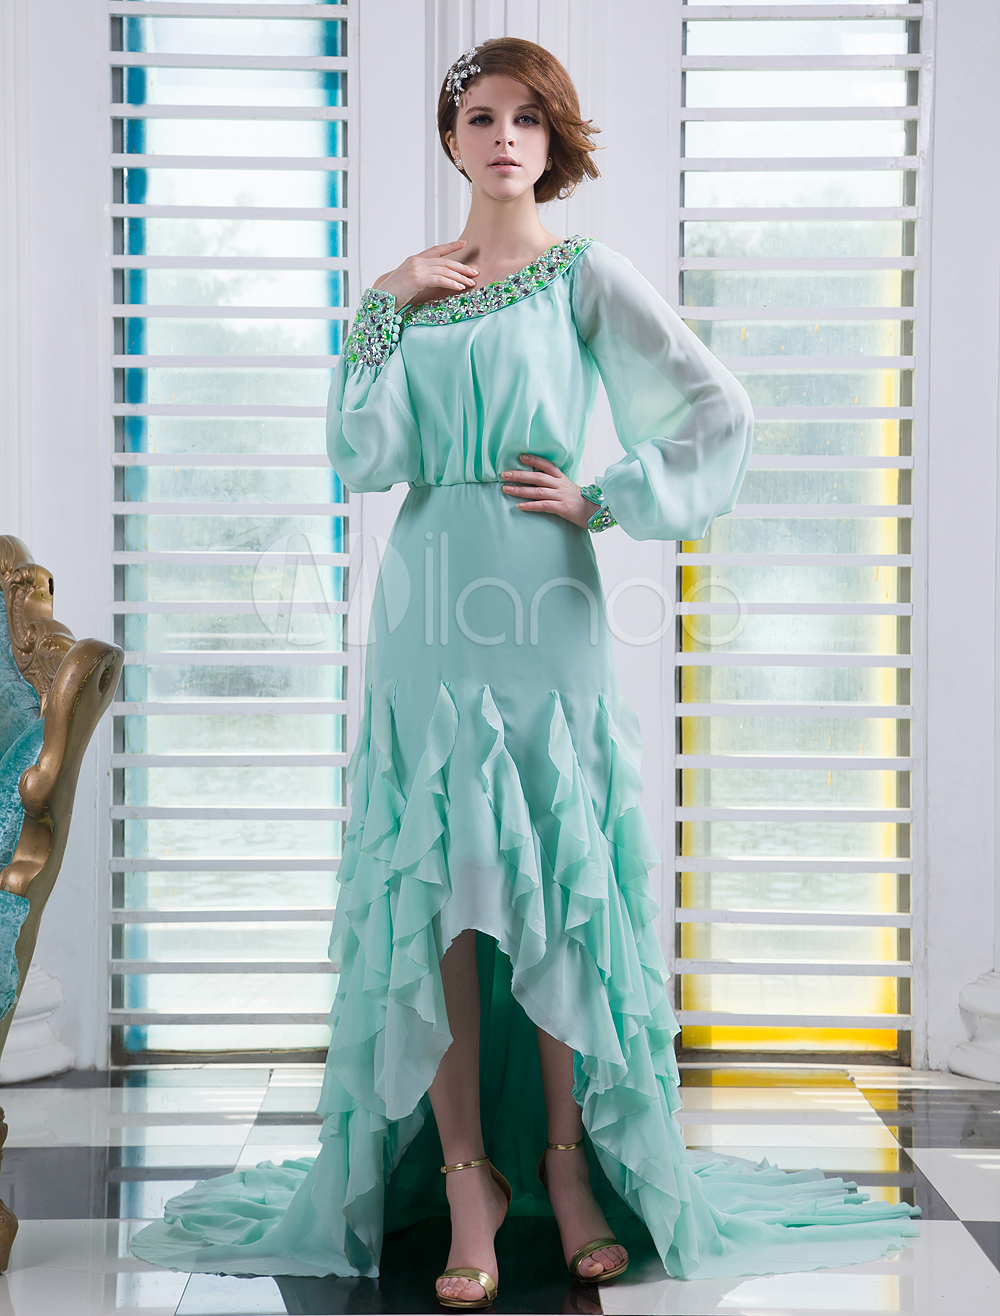 Mint Green One-Shoulder Long Sleeves Beading Sheath Chiffon Prom Dress Milanoo (Wedding Prom Dresses) photo